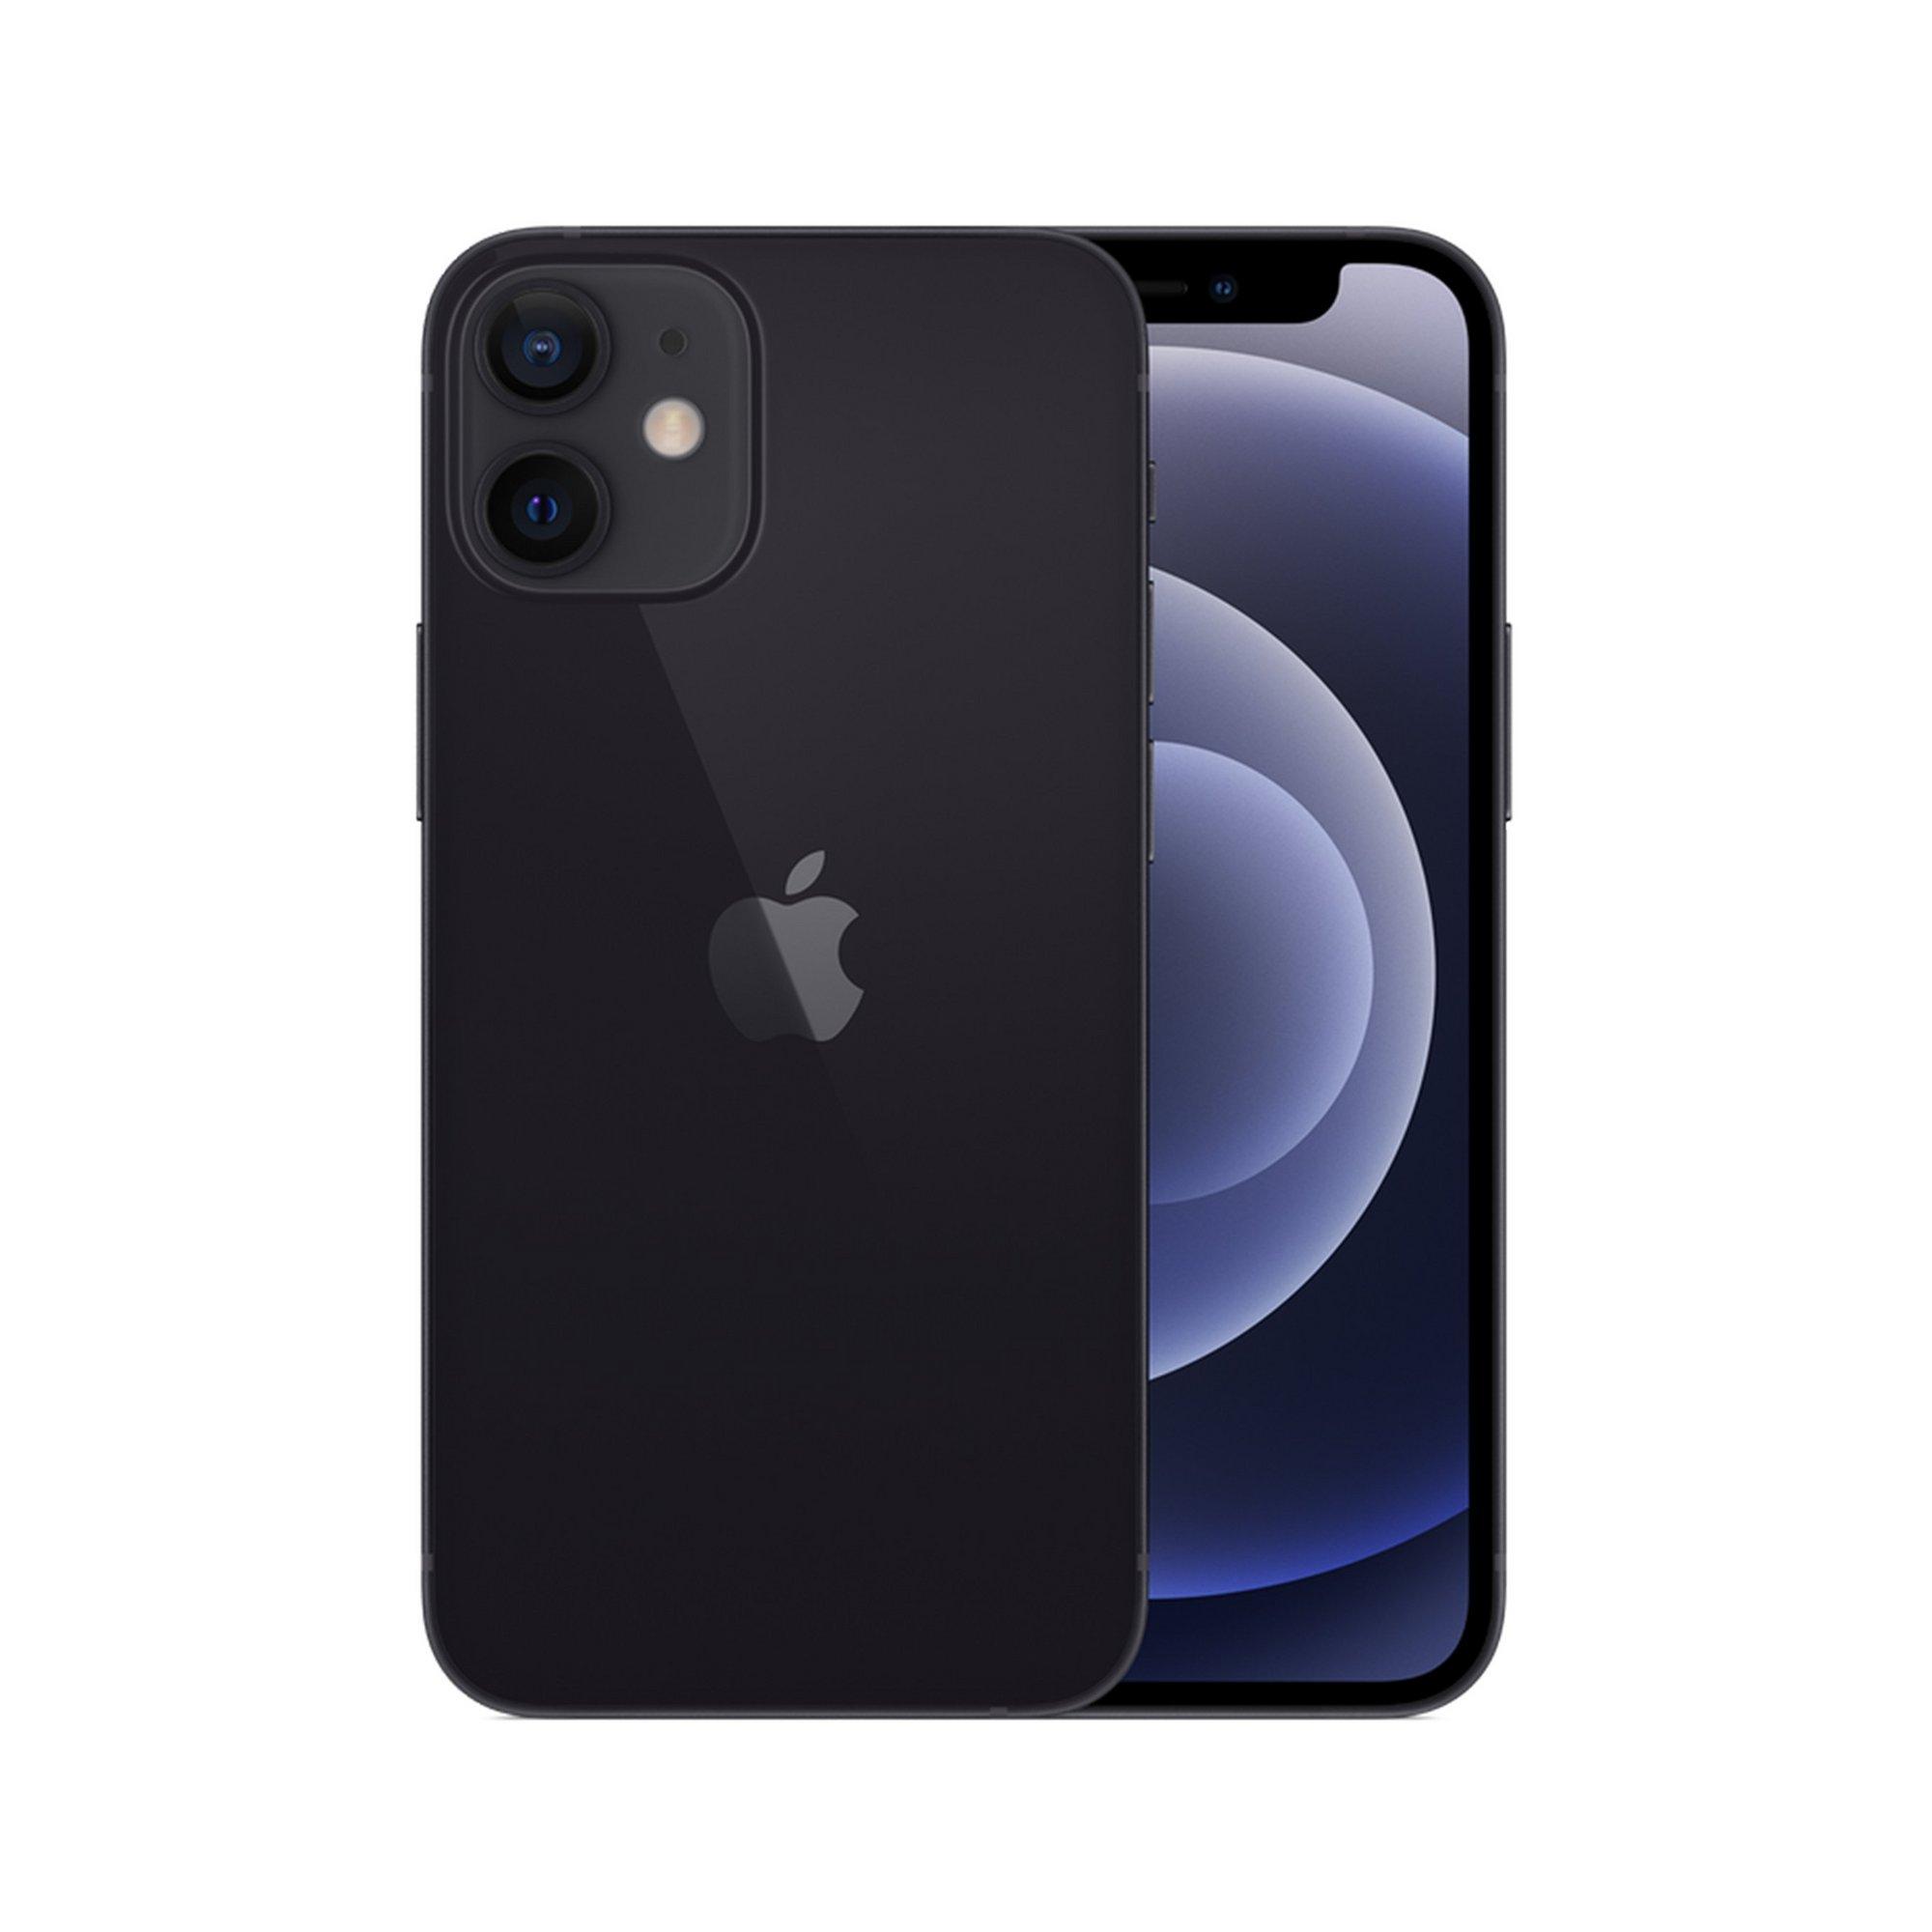 Image of iPhone 12 128GB